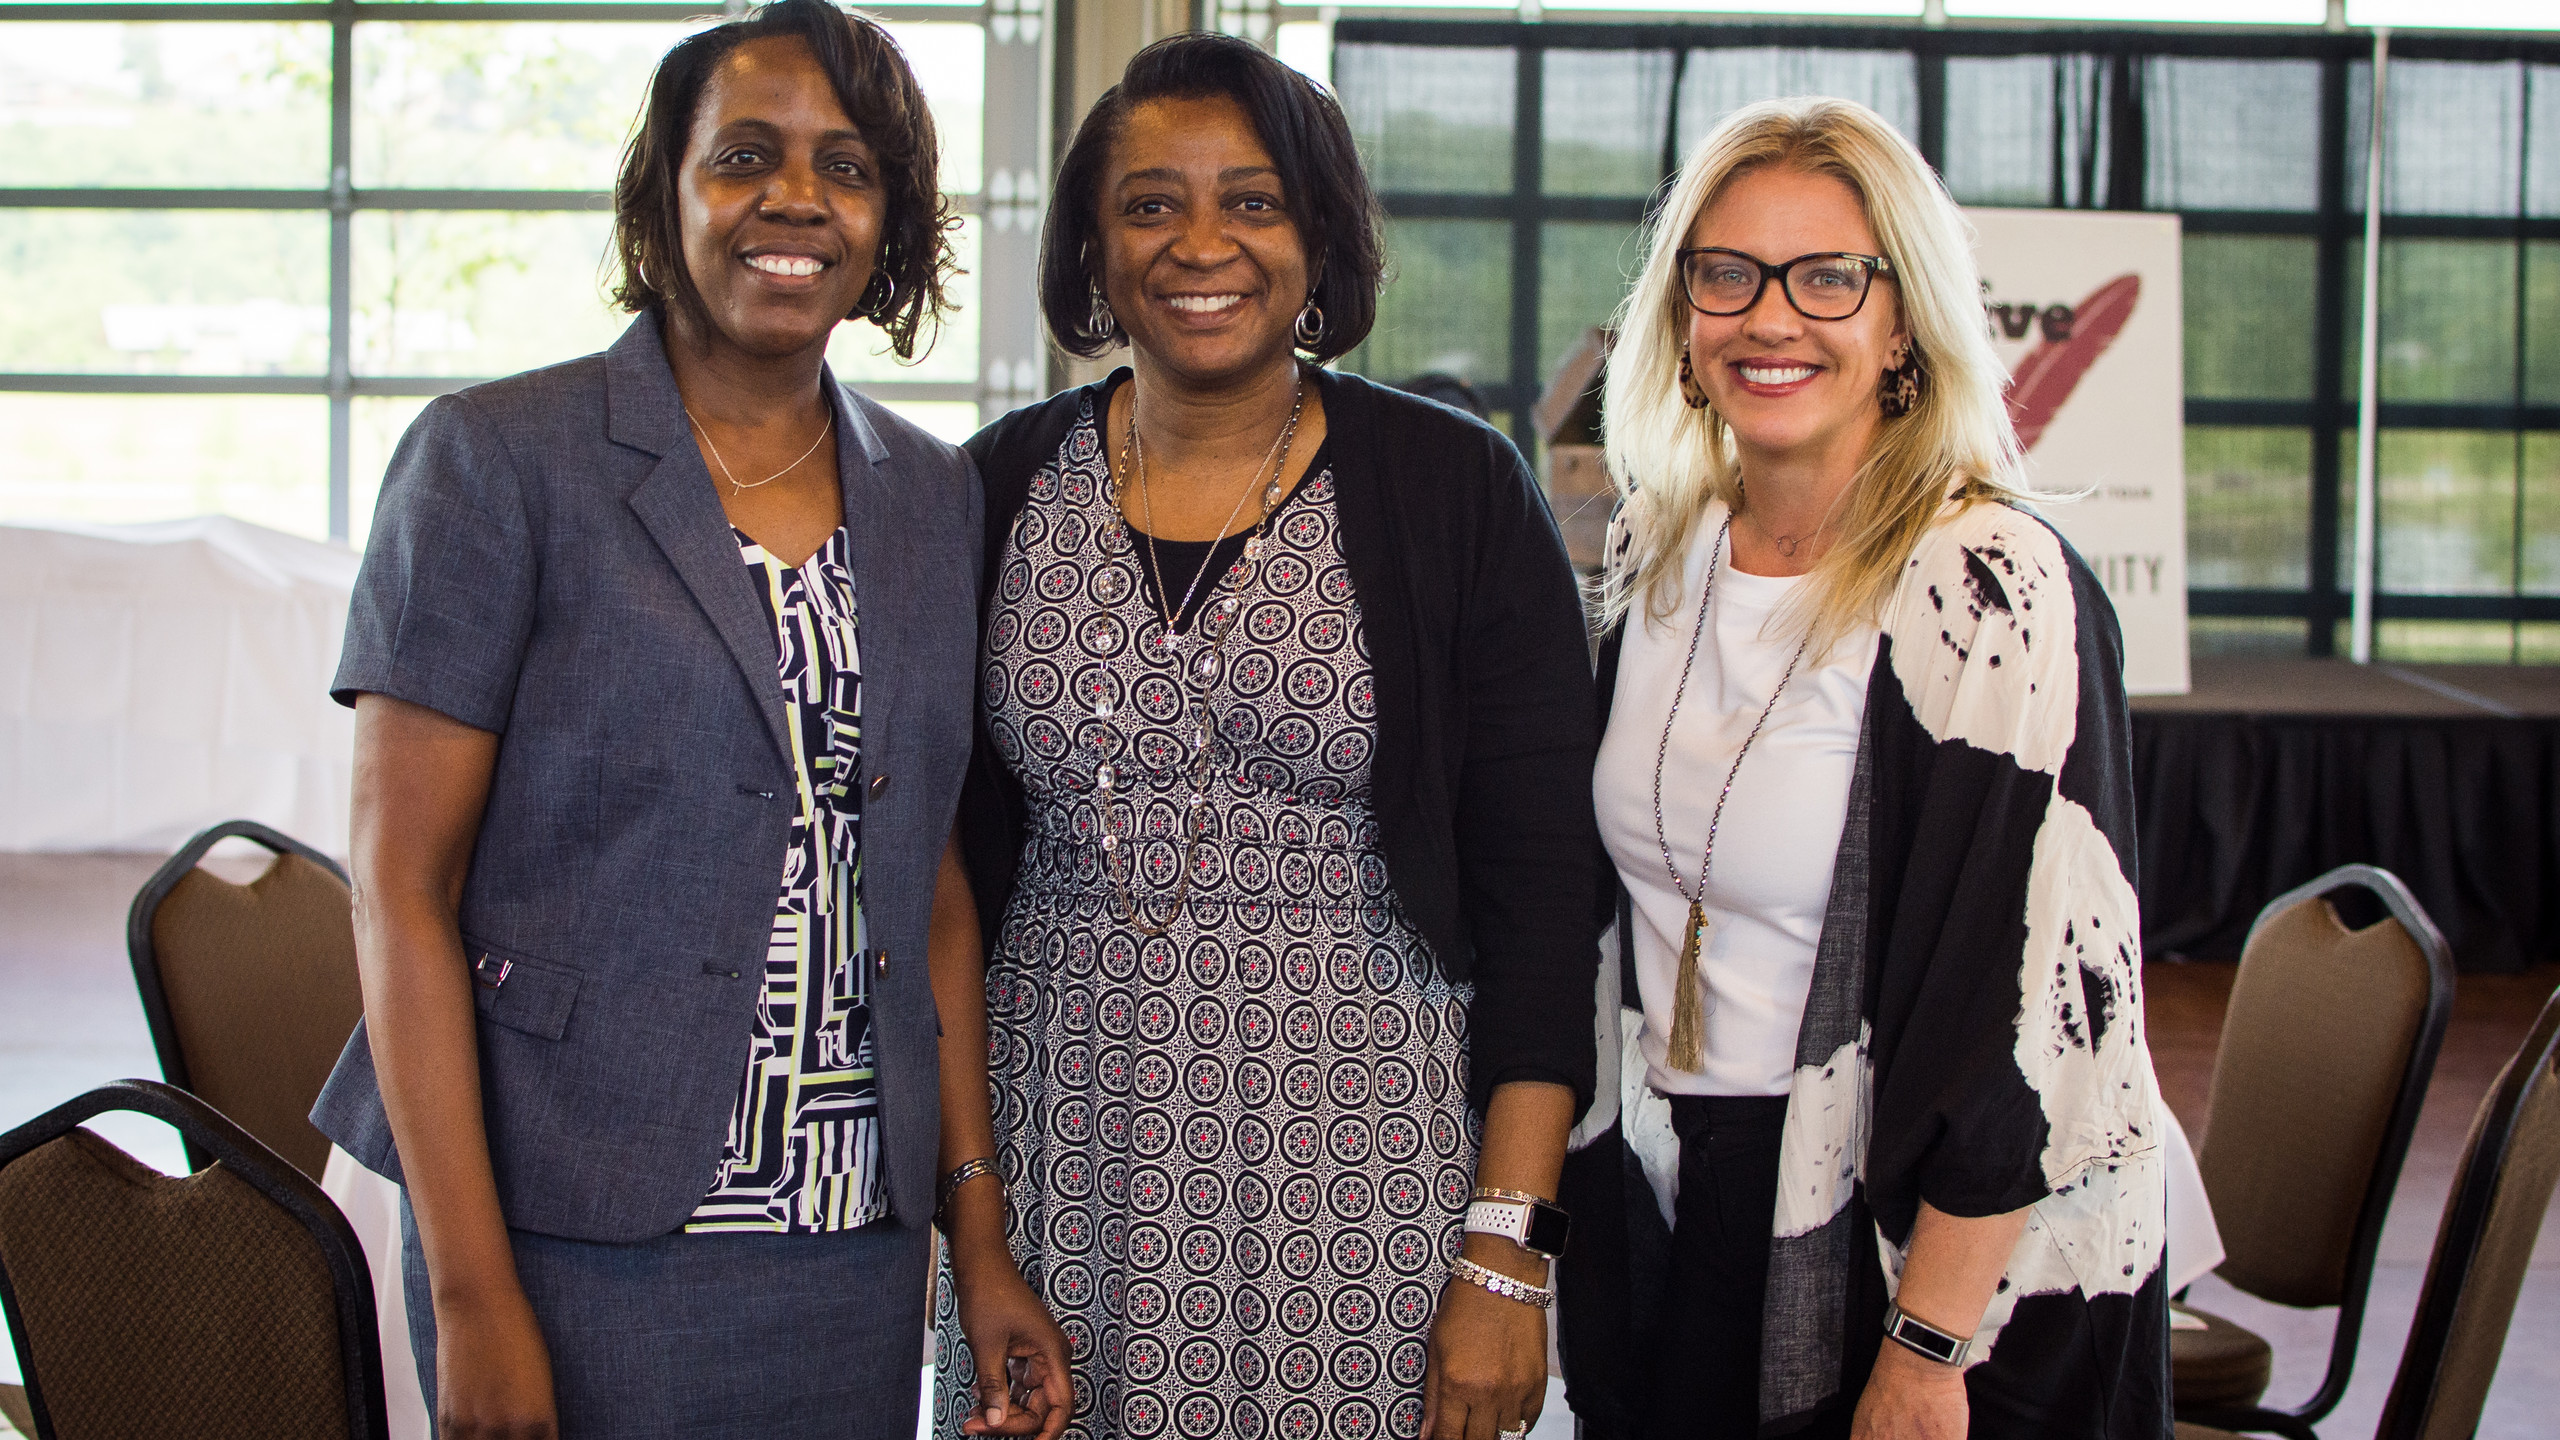 Sherry Robertson, Brenda Jones, and Erinne Hester